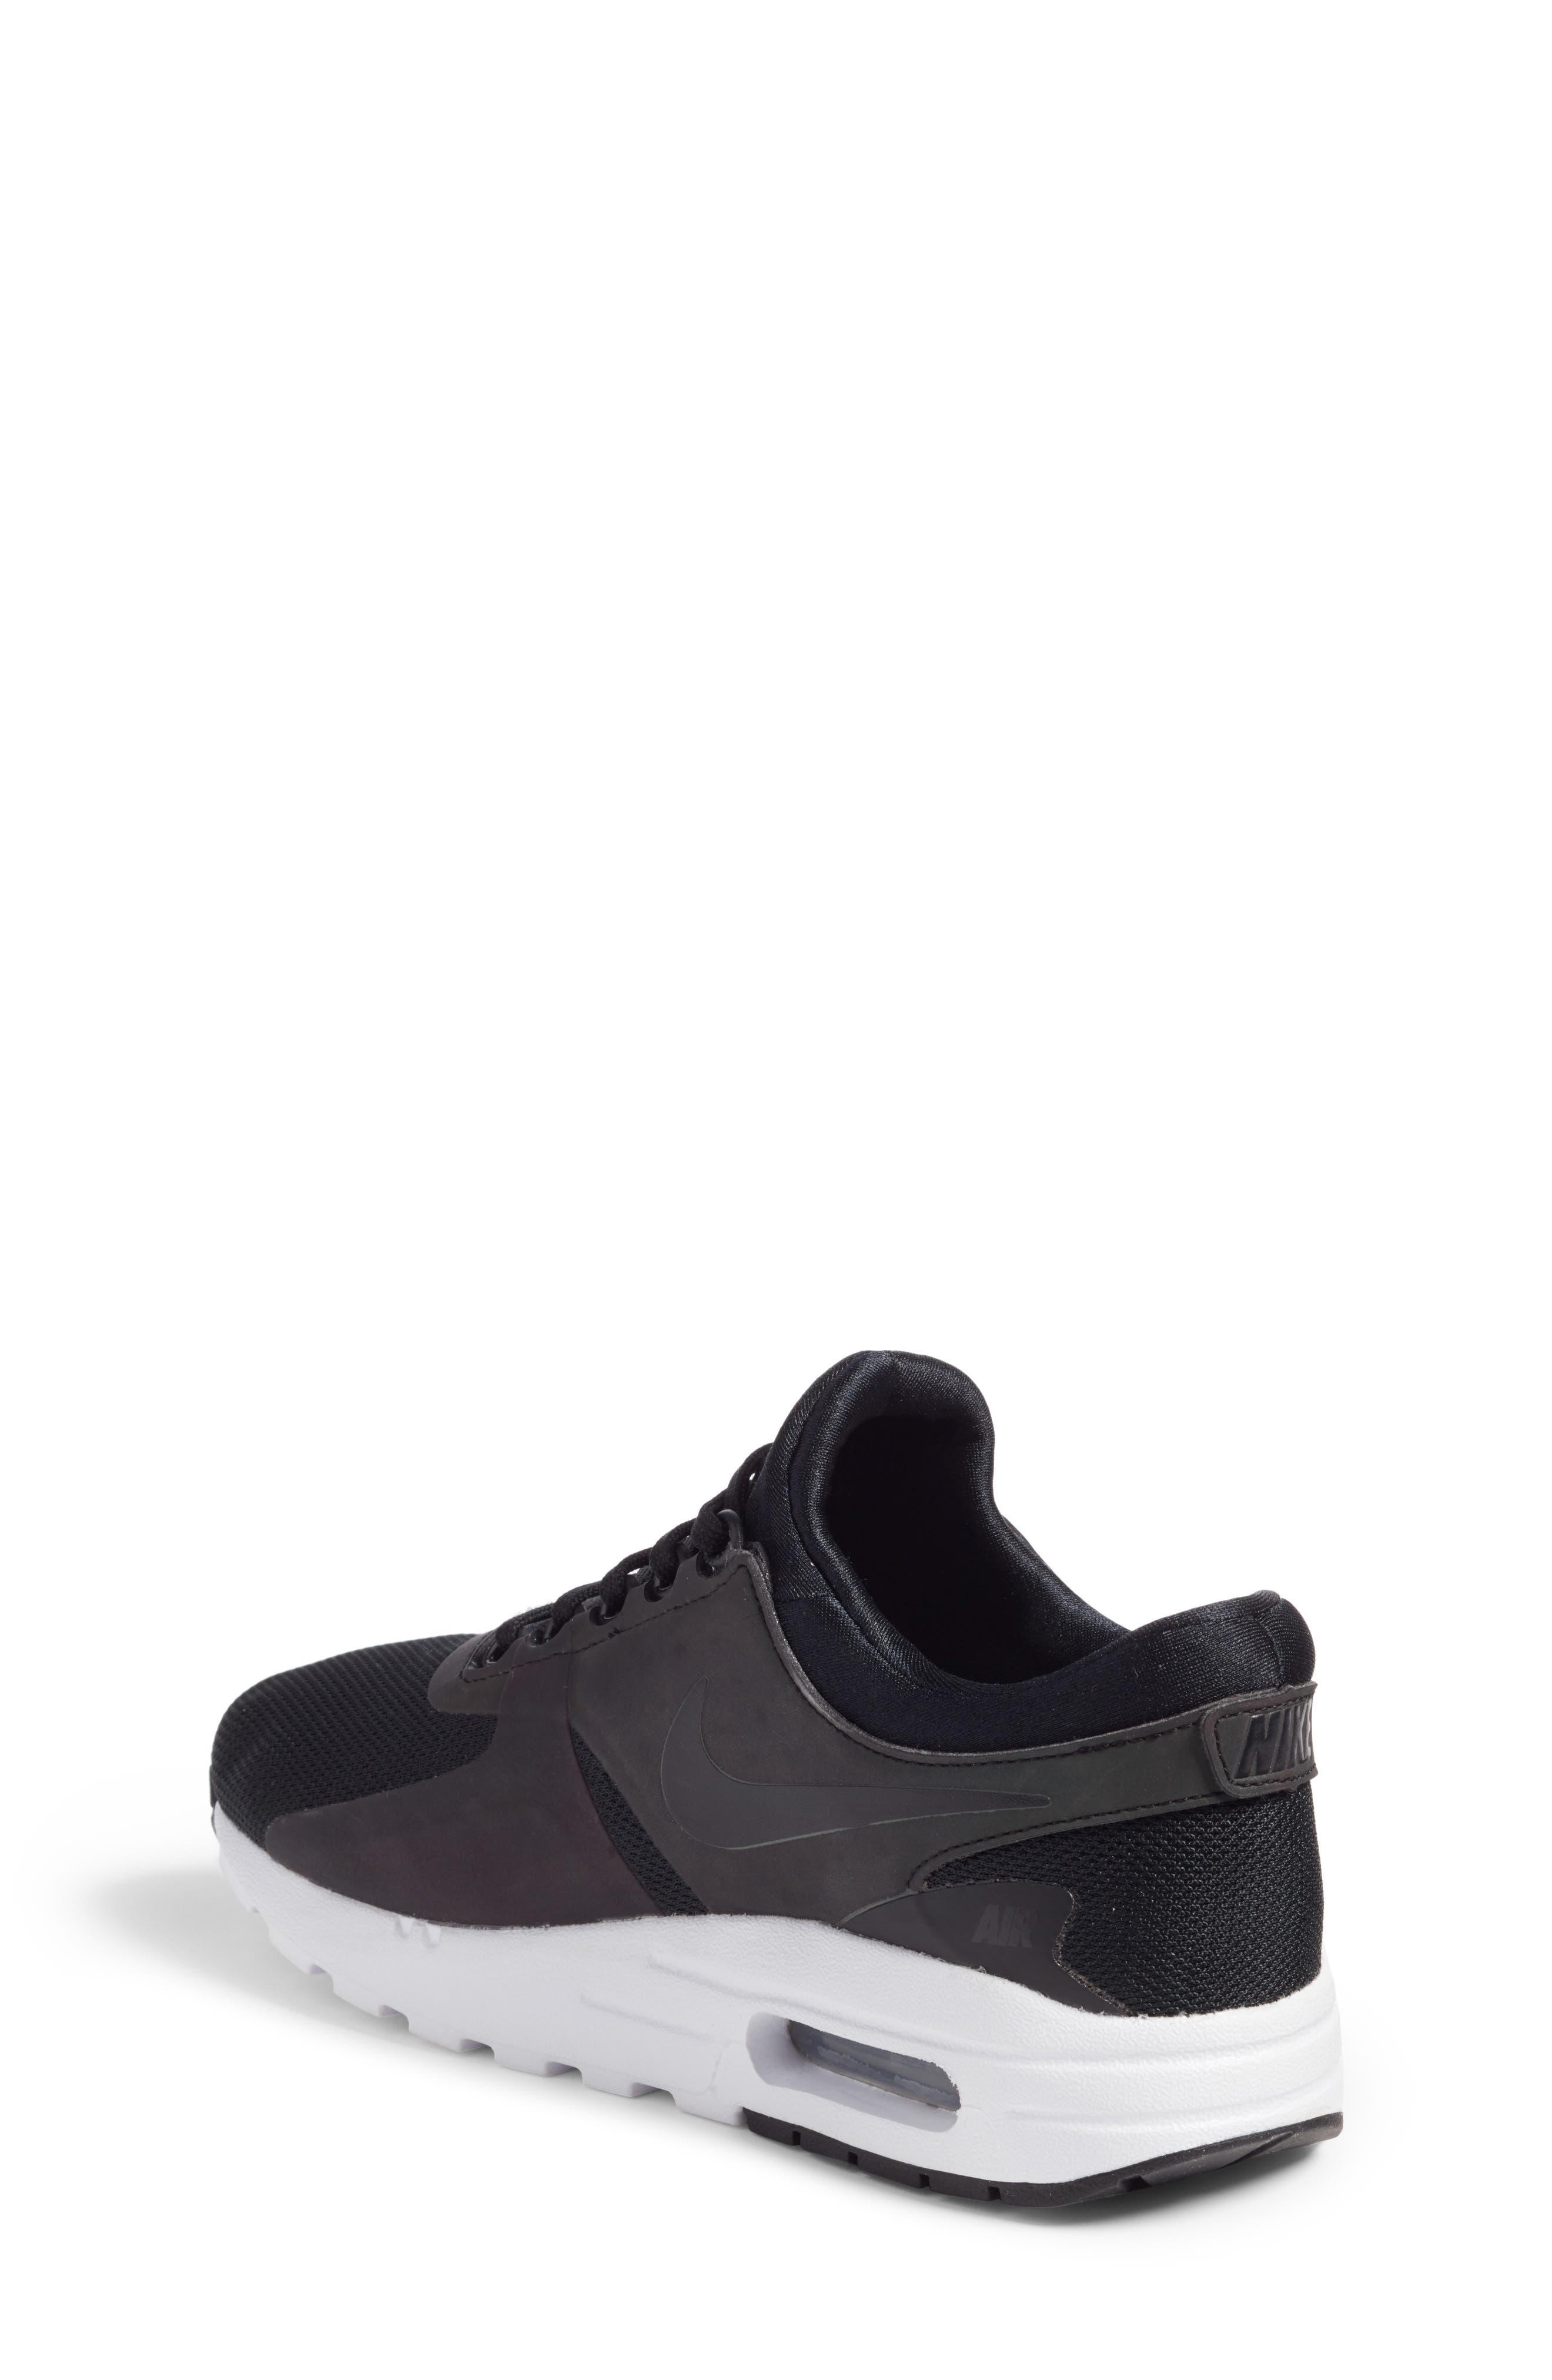 Air Max Zero Sneaker,                             Alternate thumbnail 2, color,